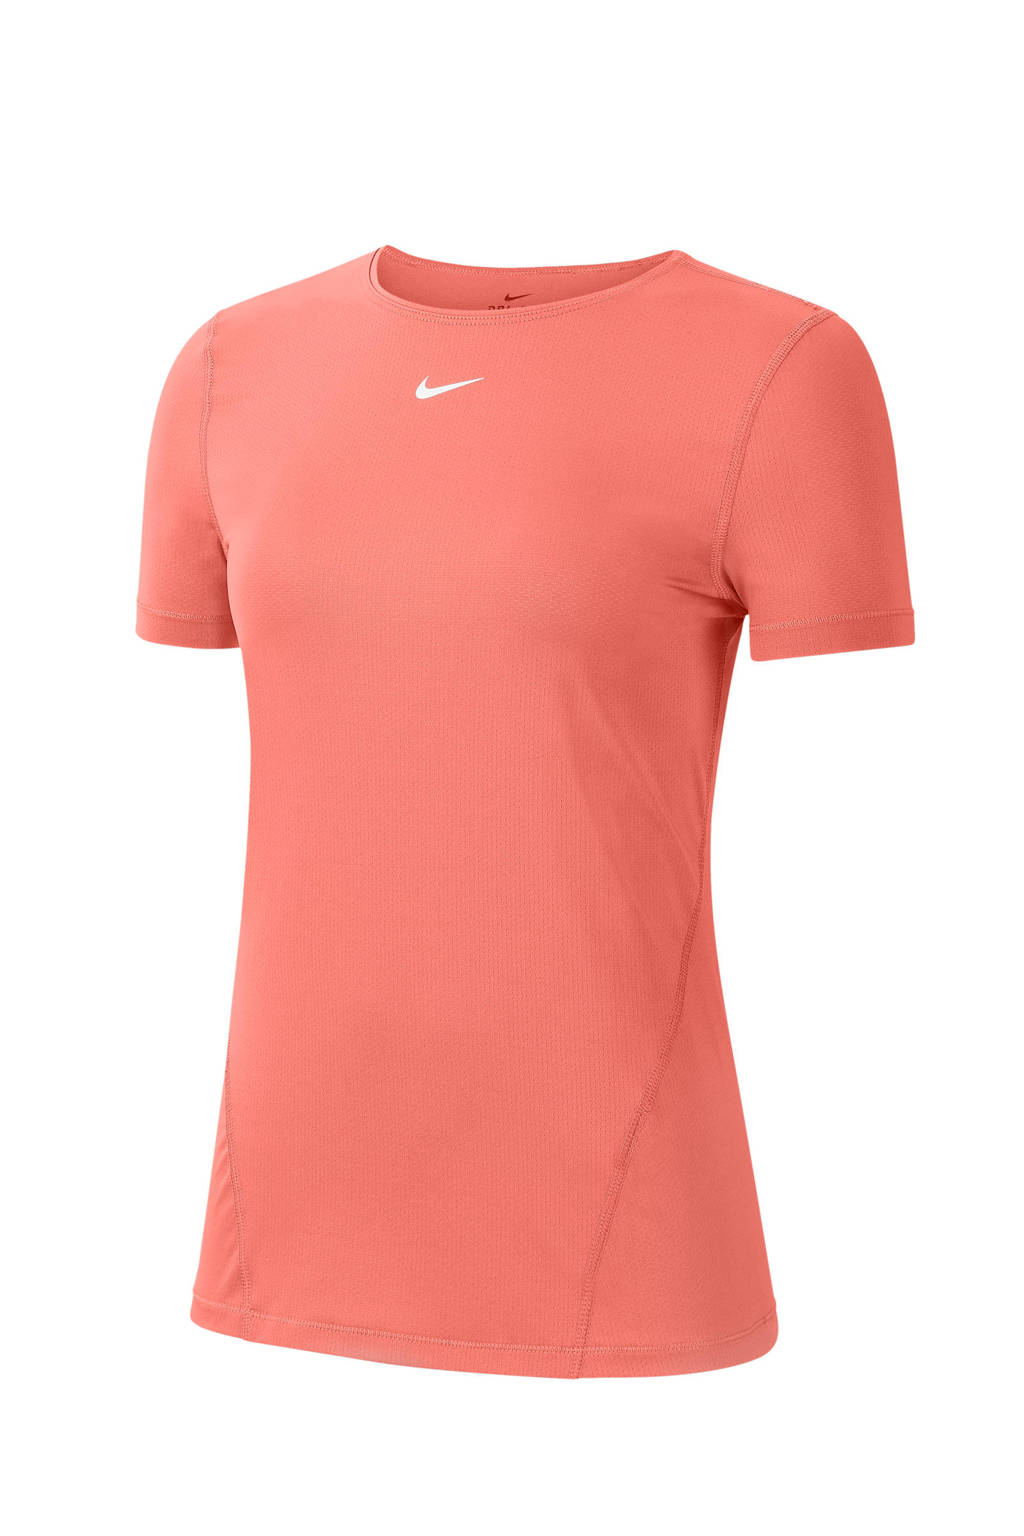 Oranje dames t-shirt Nike Pro - AO9951-854